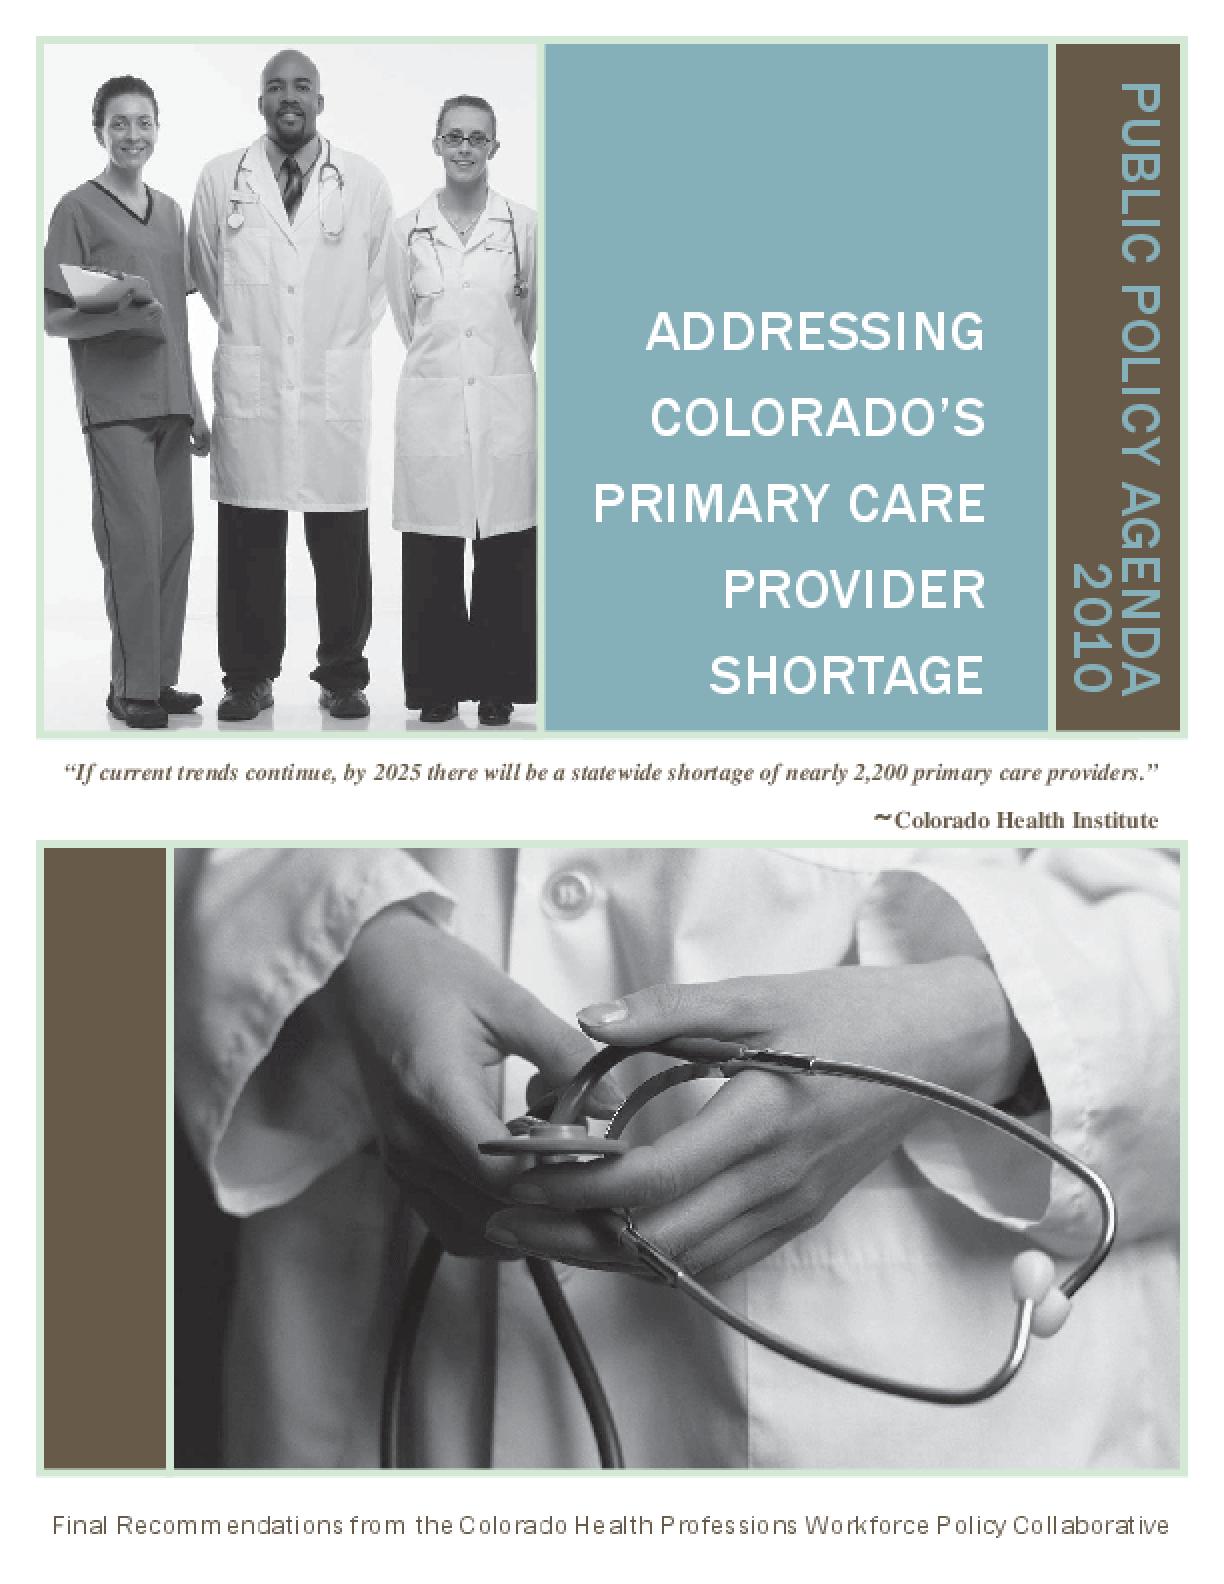 Addressing Colorado's Primary Care Provider Shortage